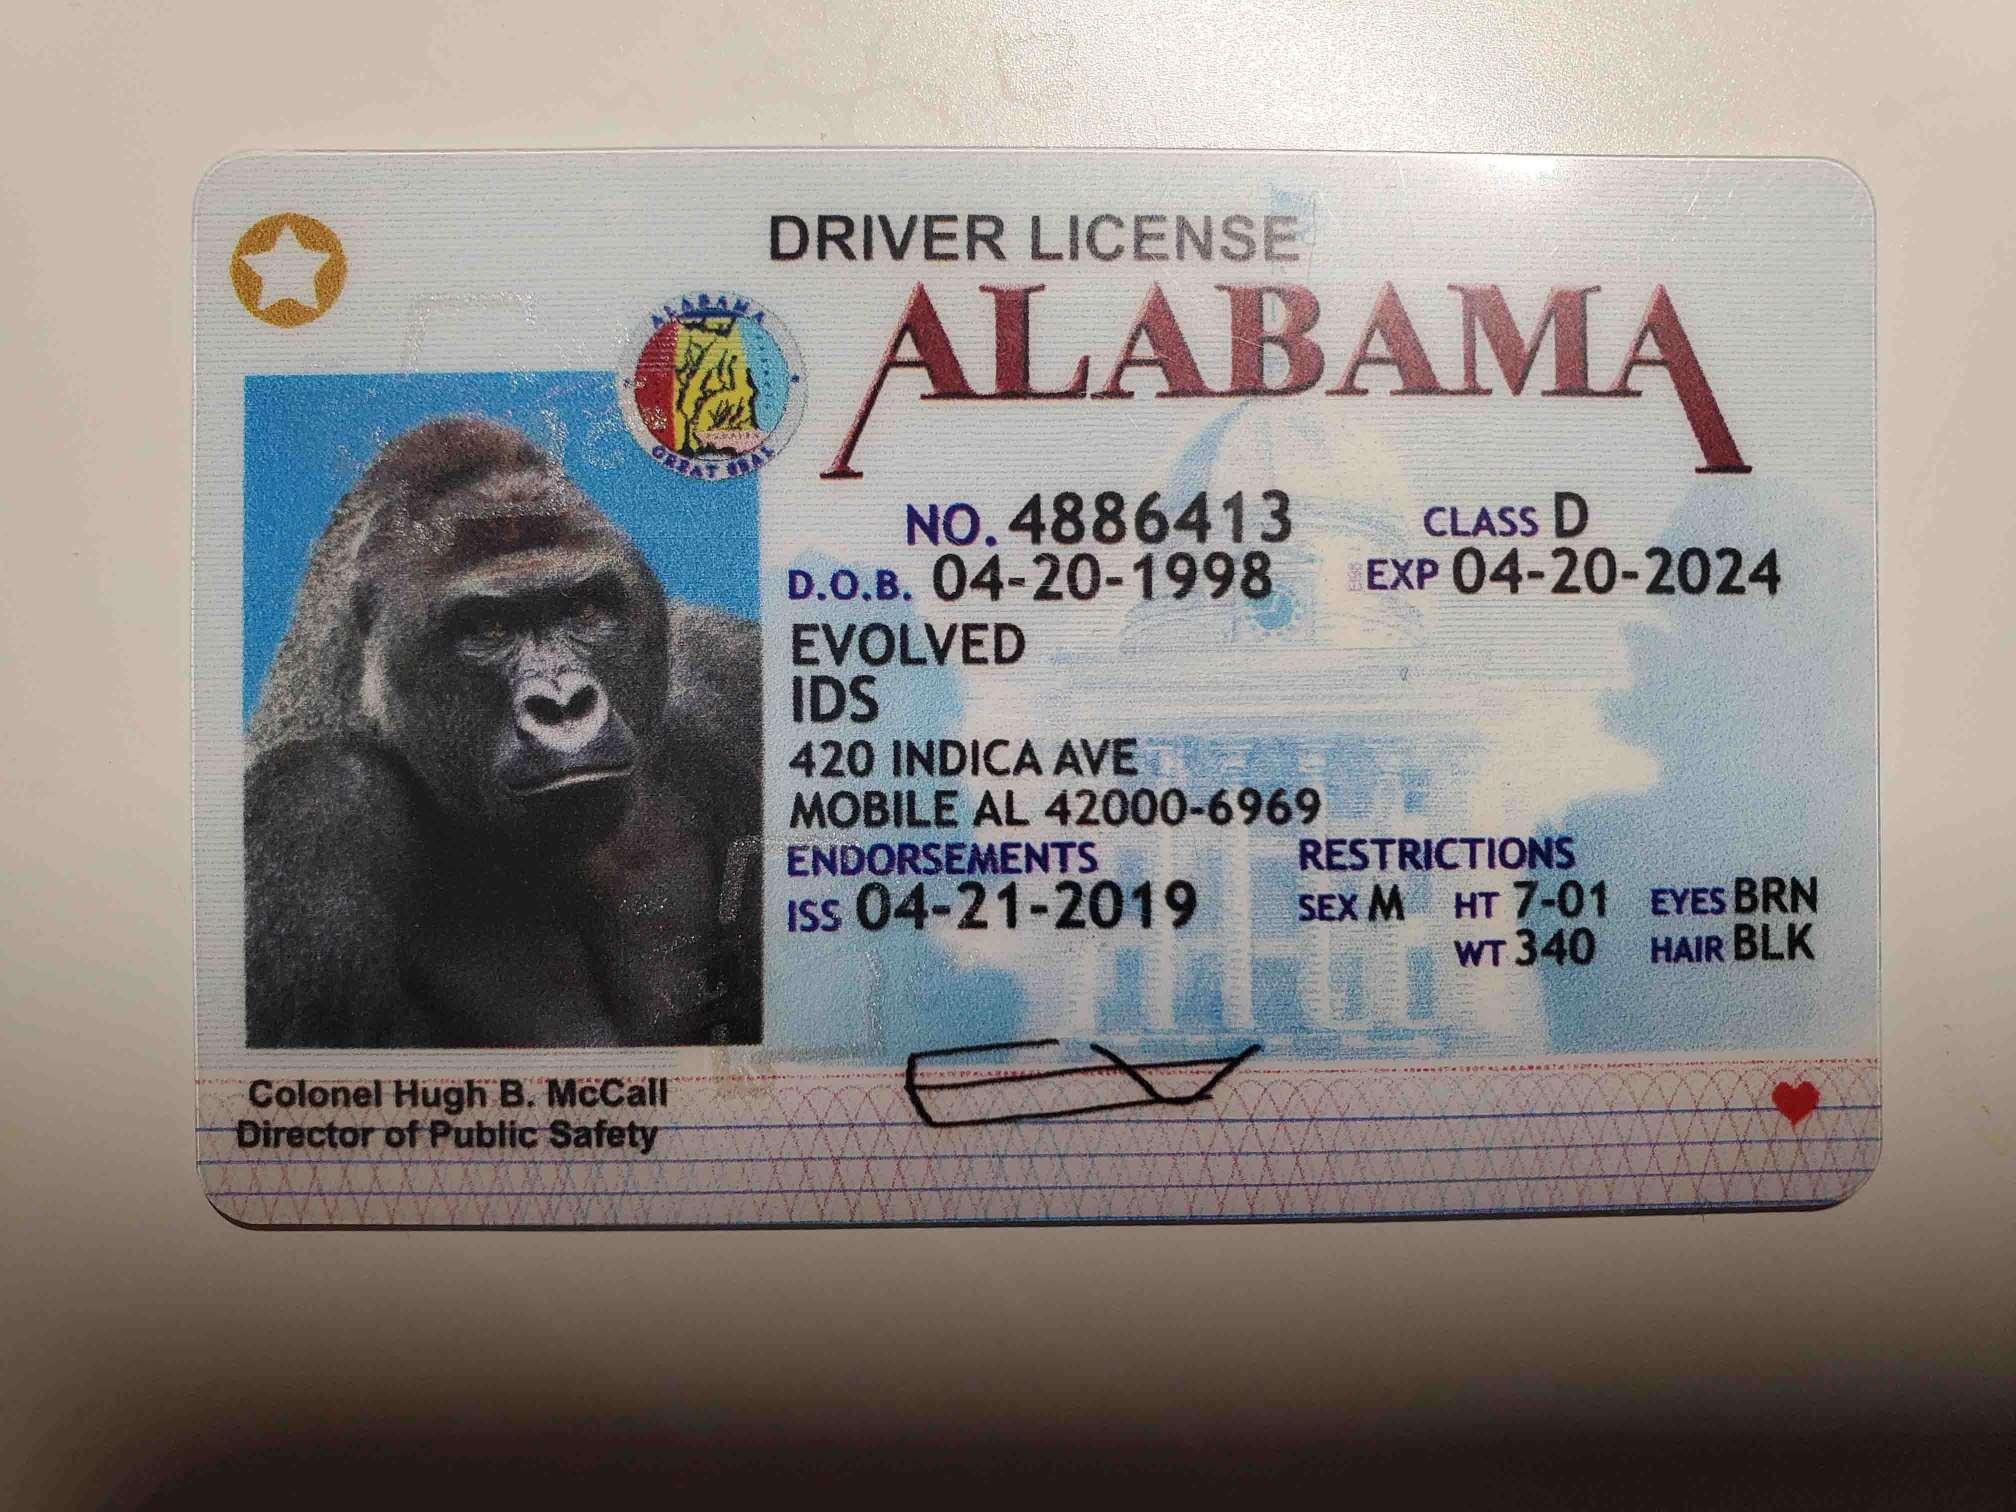 Alabama Fake ID Front